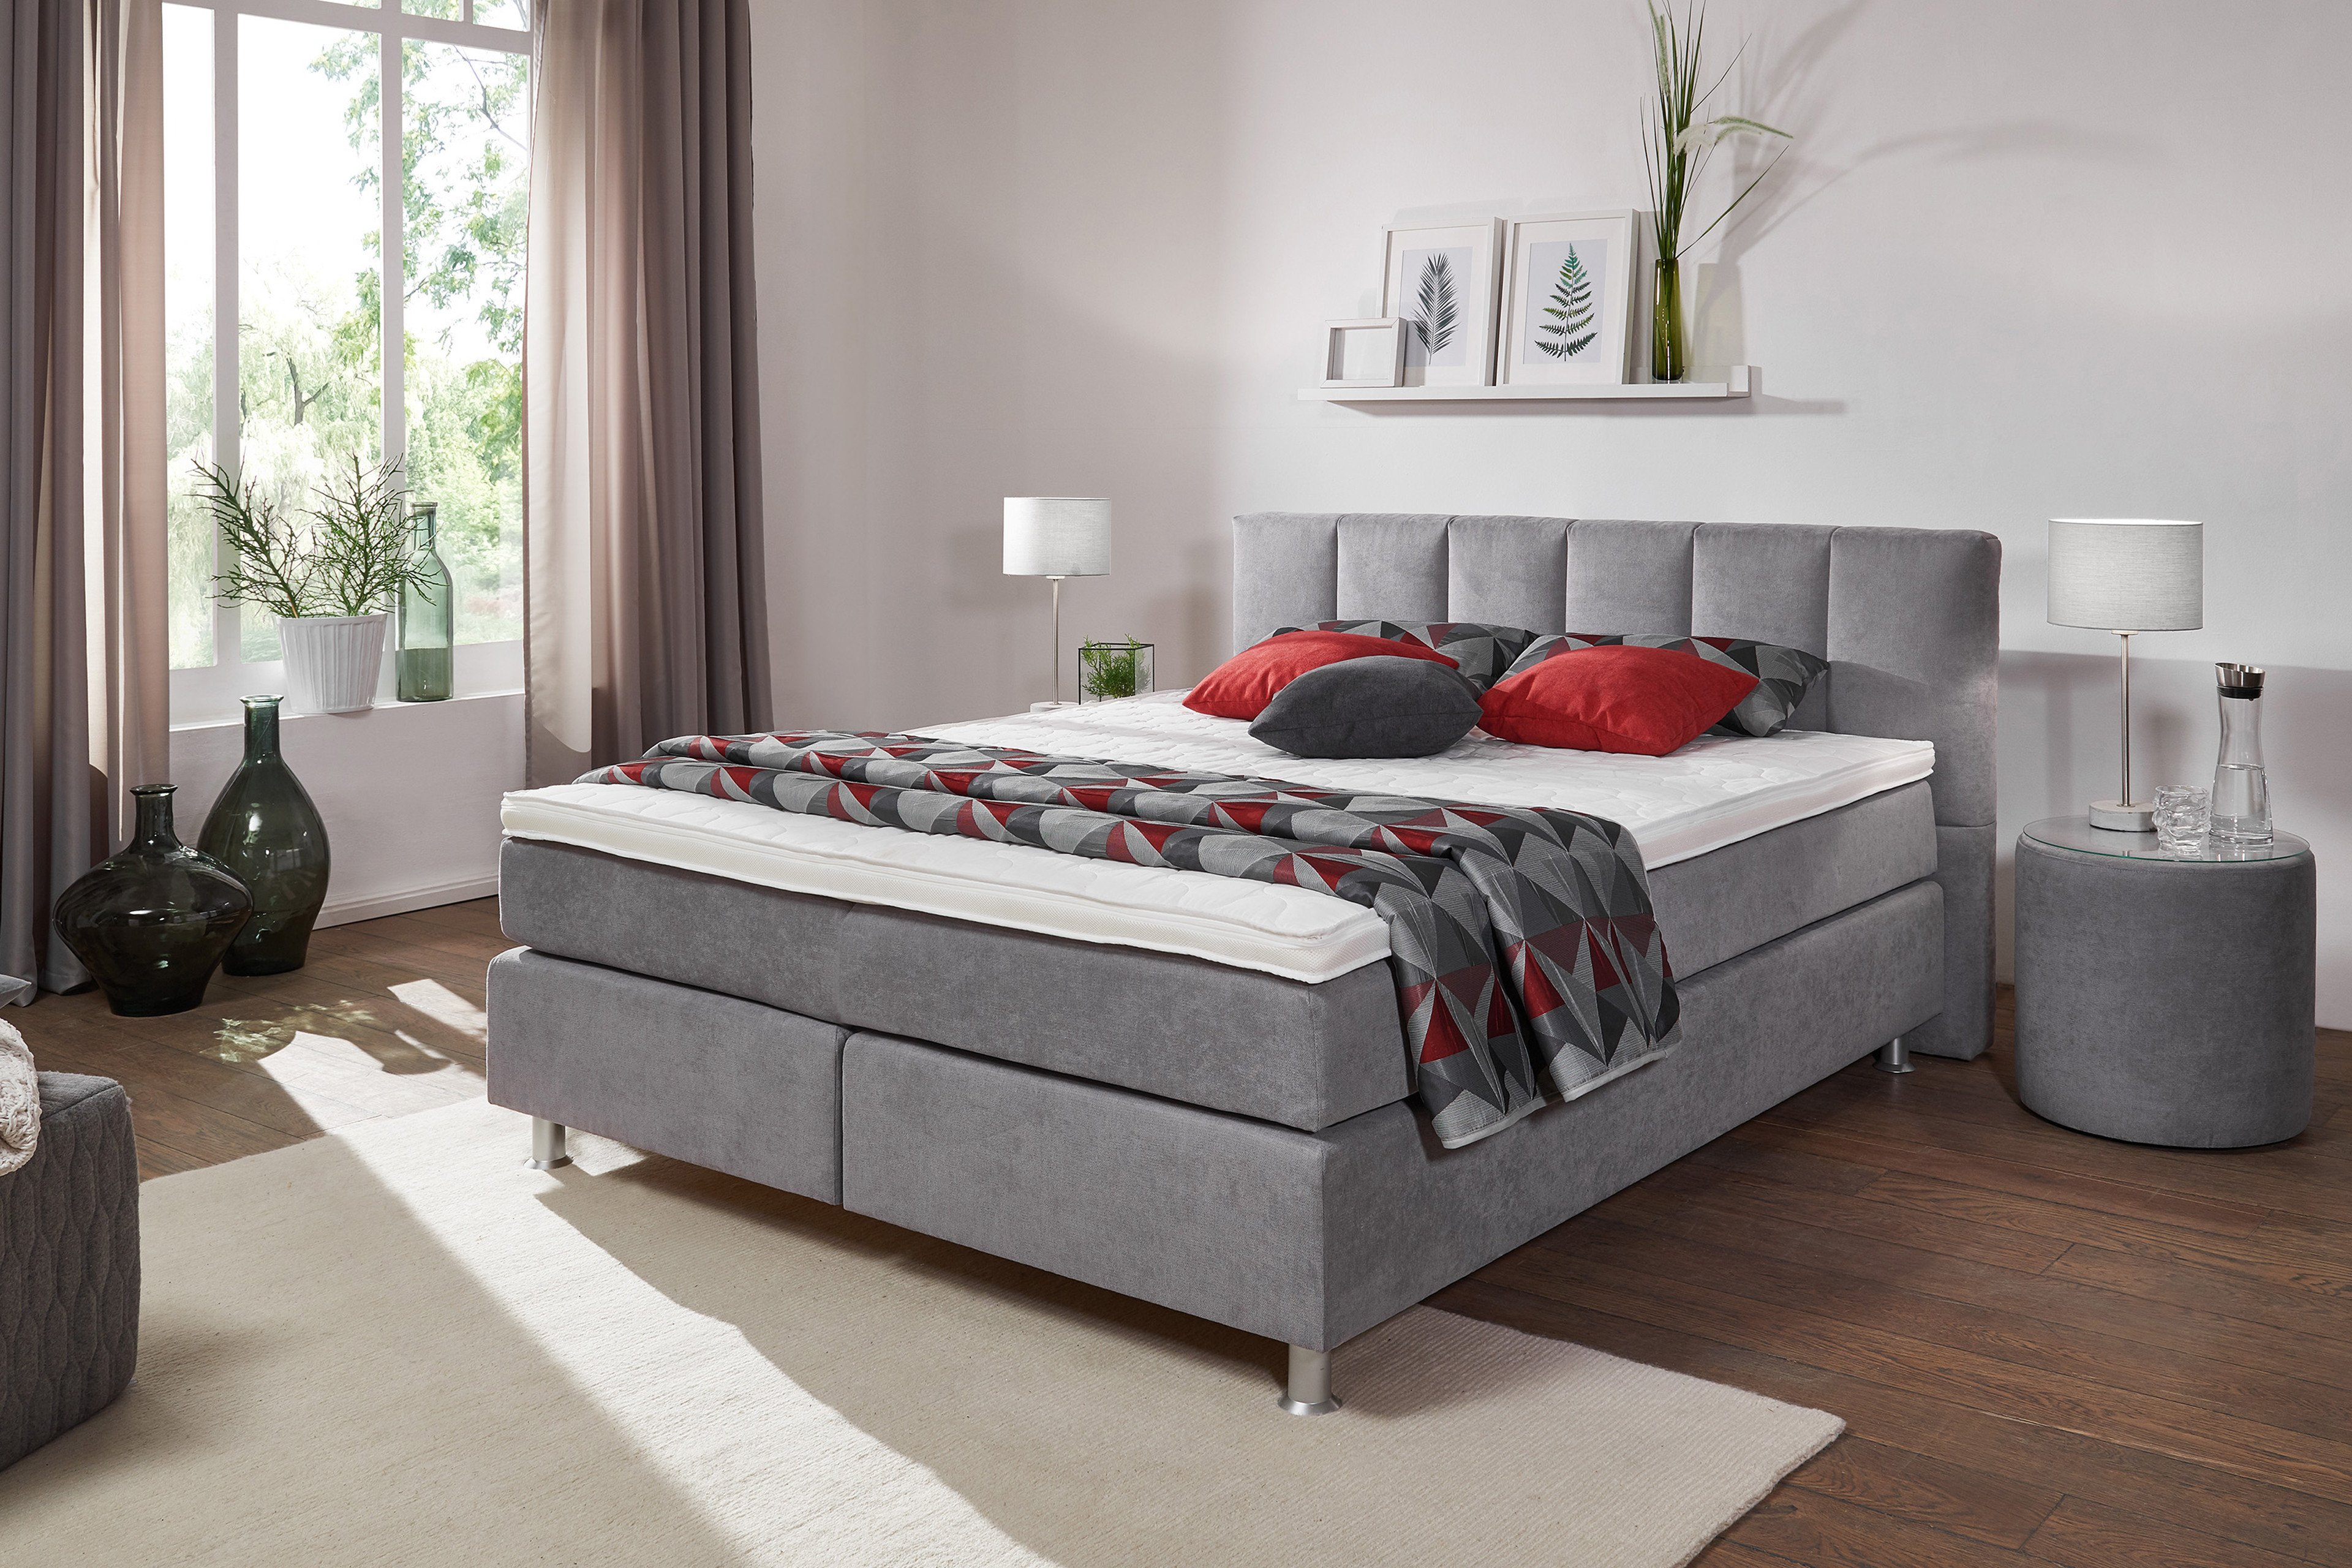 oschmann easy good belcanto boxspringbett in grau m bel letz ihr online shop. Black Bedroom Furniture Sets. Home Design Ideas